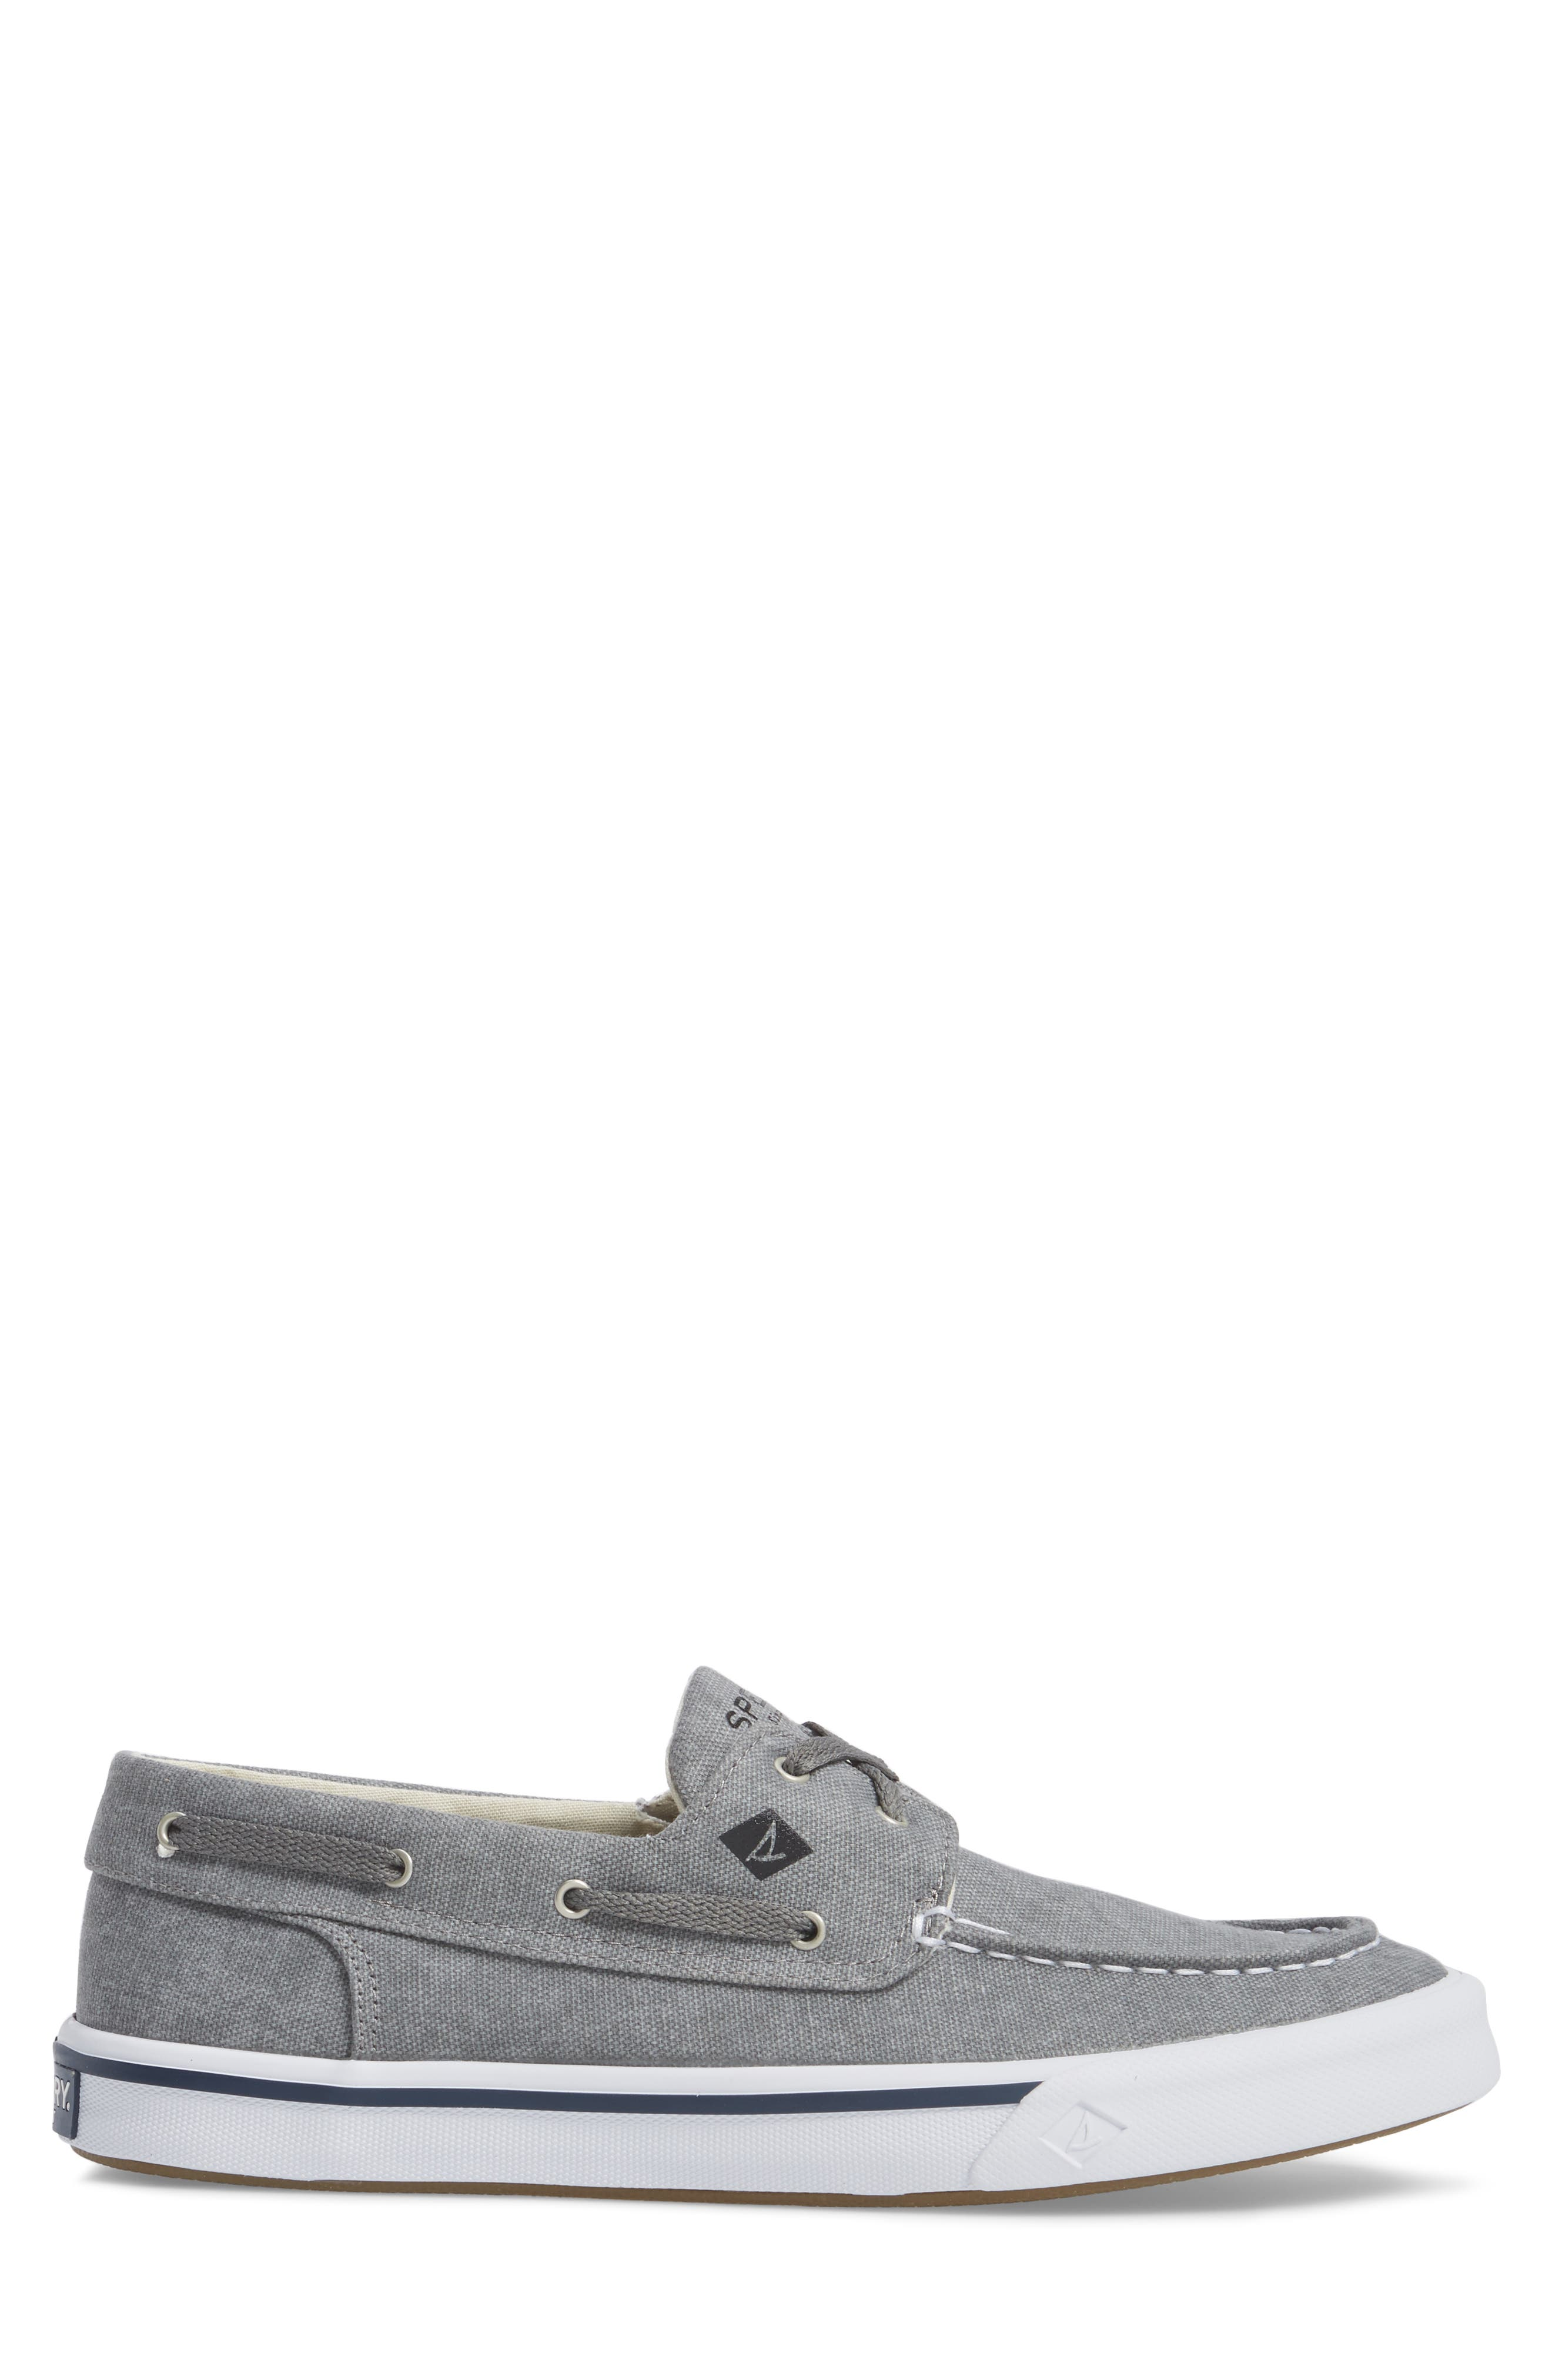 Striper 2 Boat Shoe,                             Alternate thumbnail 3, color,                             GREY CANVAS